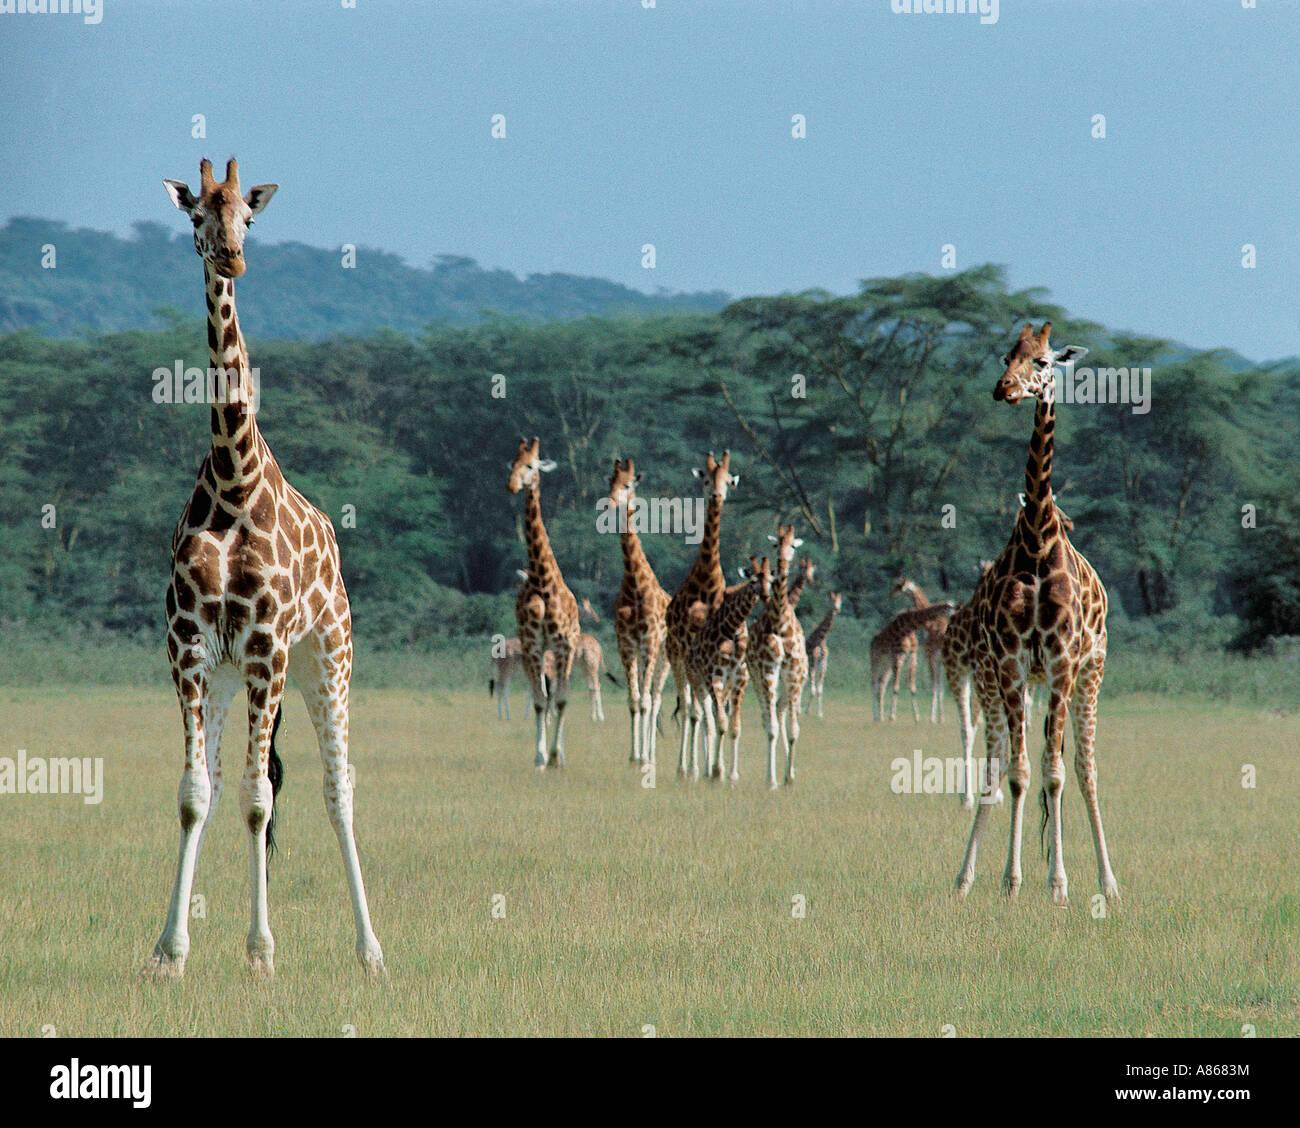 Herd of Rothschild s Giraffe Lake Nakuru National Park Kenya - Stock Image